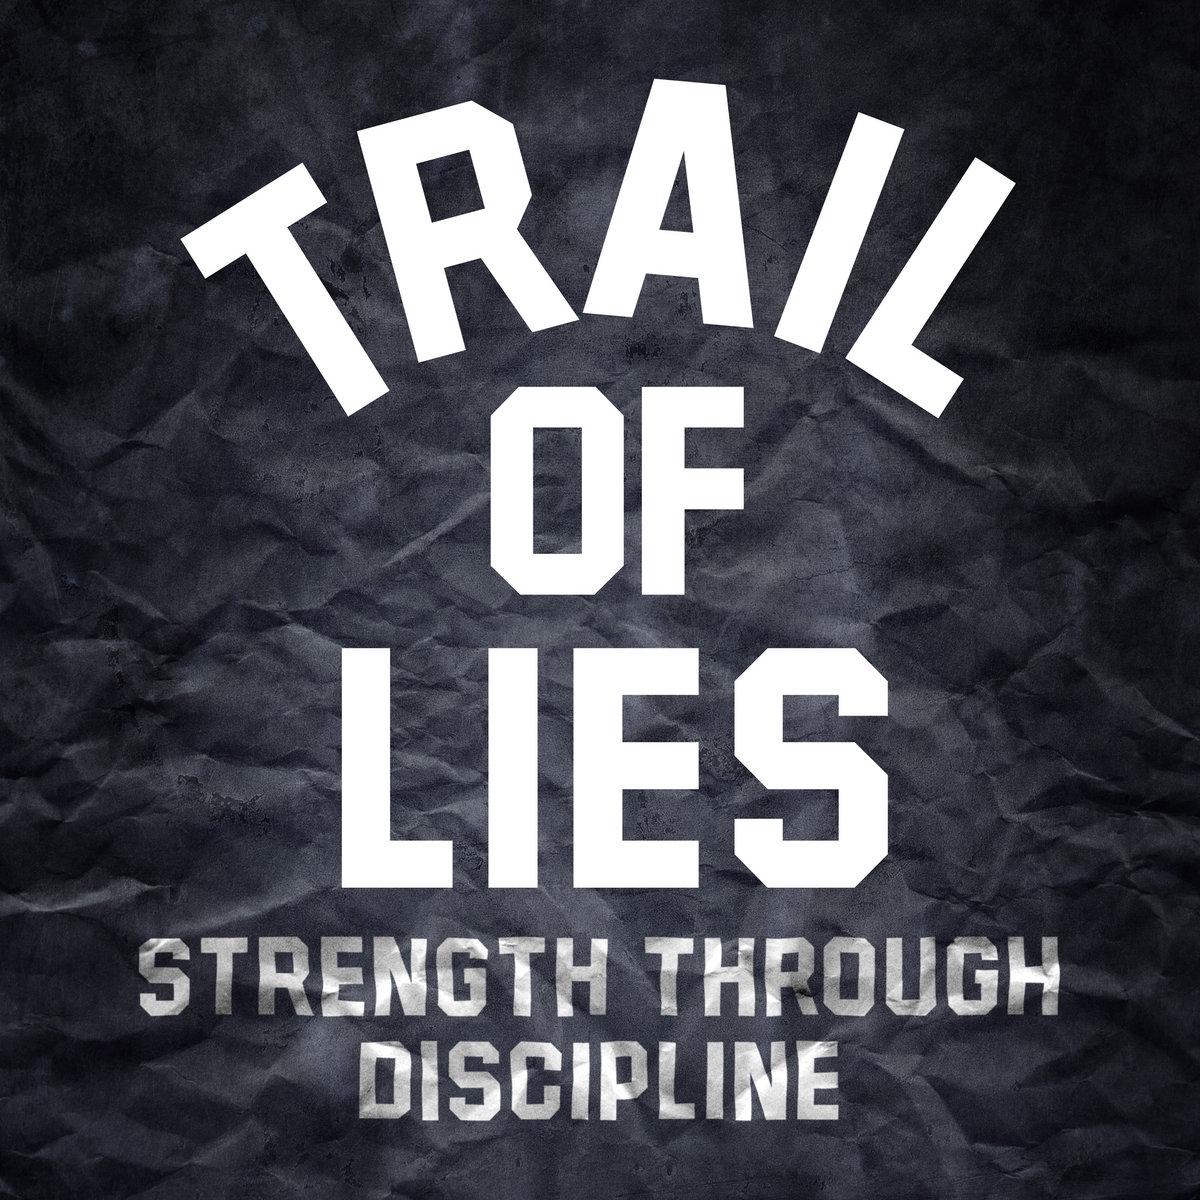 Strength Through Discipline | Trail of Lies